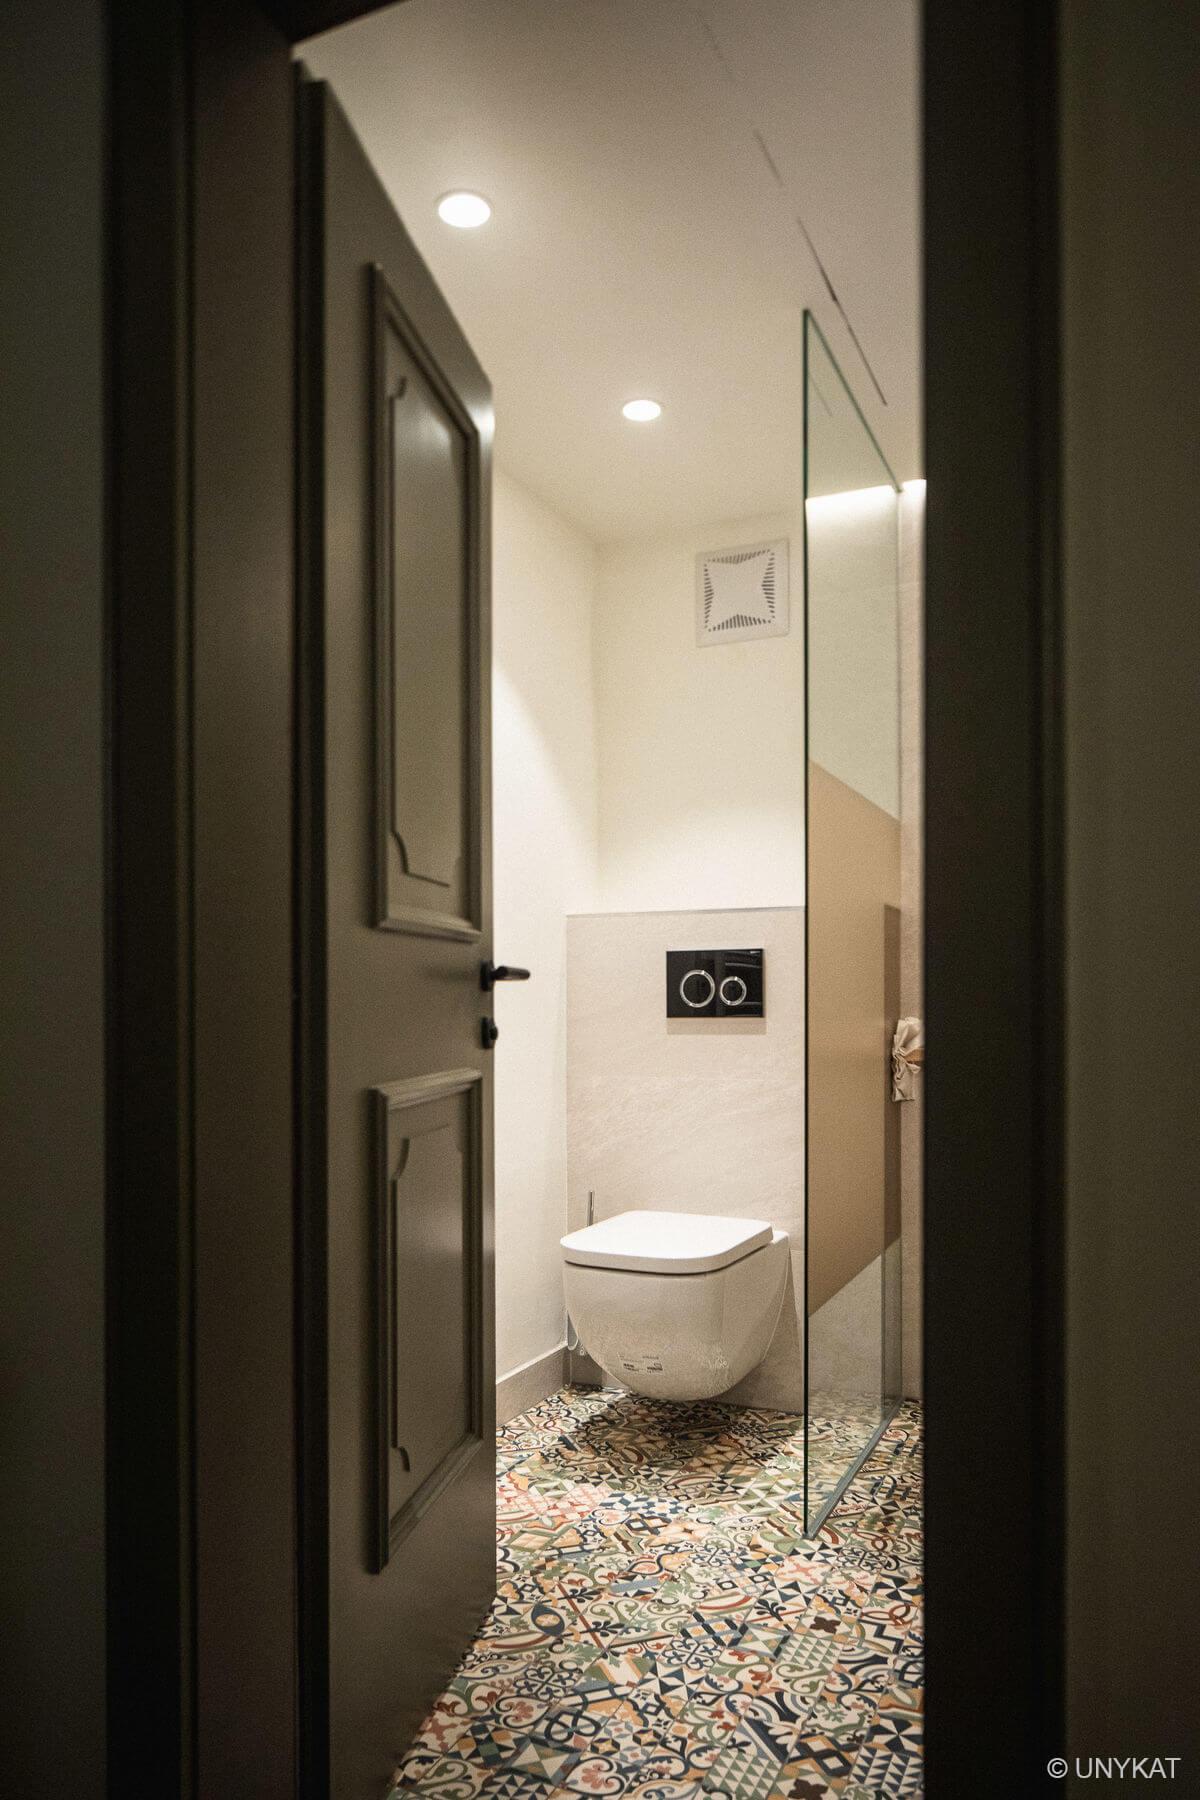 hotelausstattung-hoteleinrichtungen-bachhuber-Hotel-Gmachl2